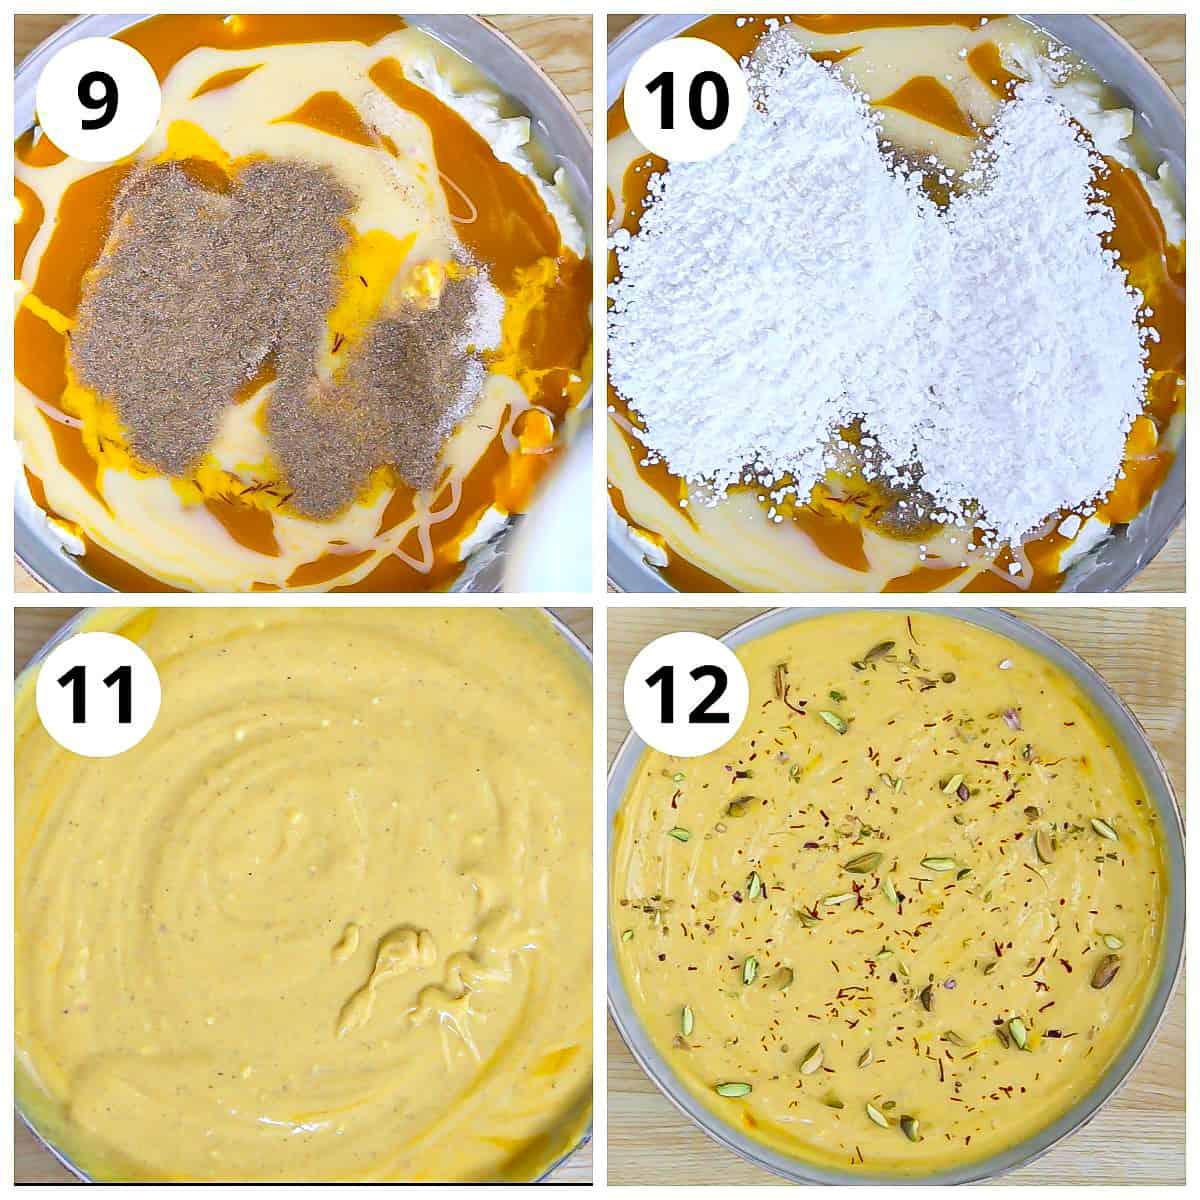 Add the powdered sugar, cardamom powder to make mango shrikhand